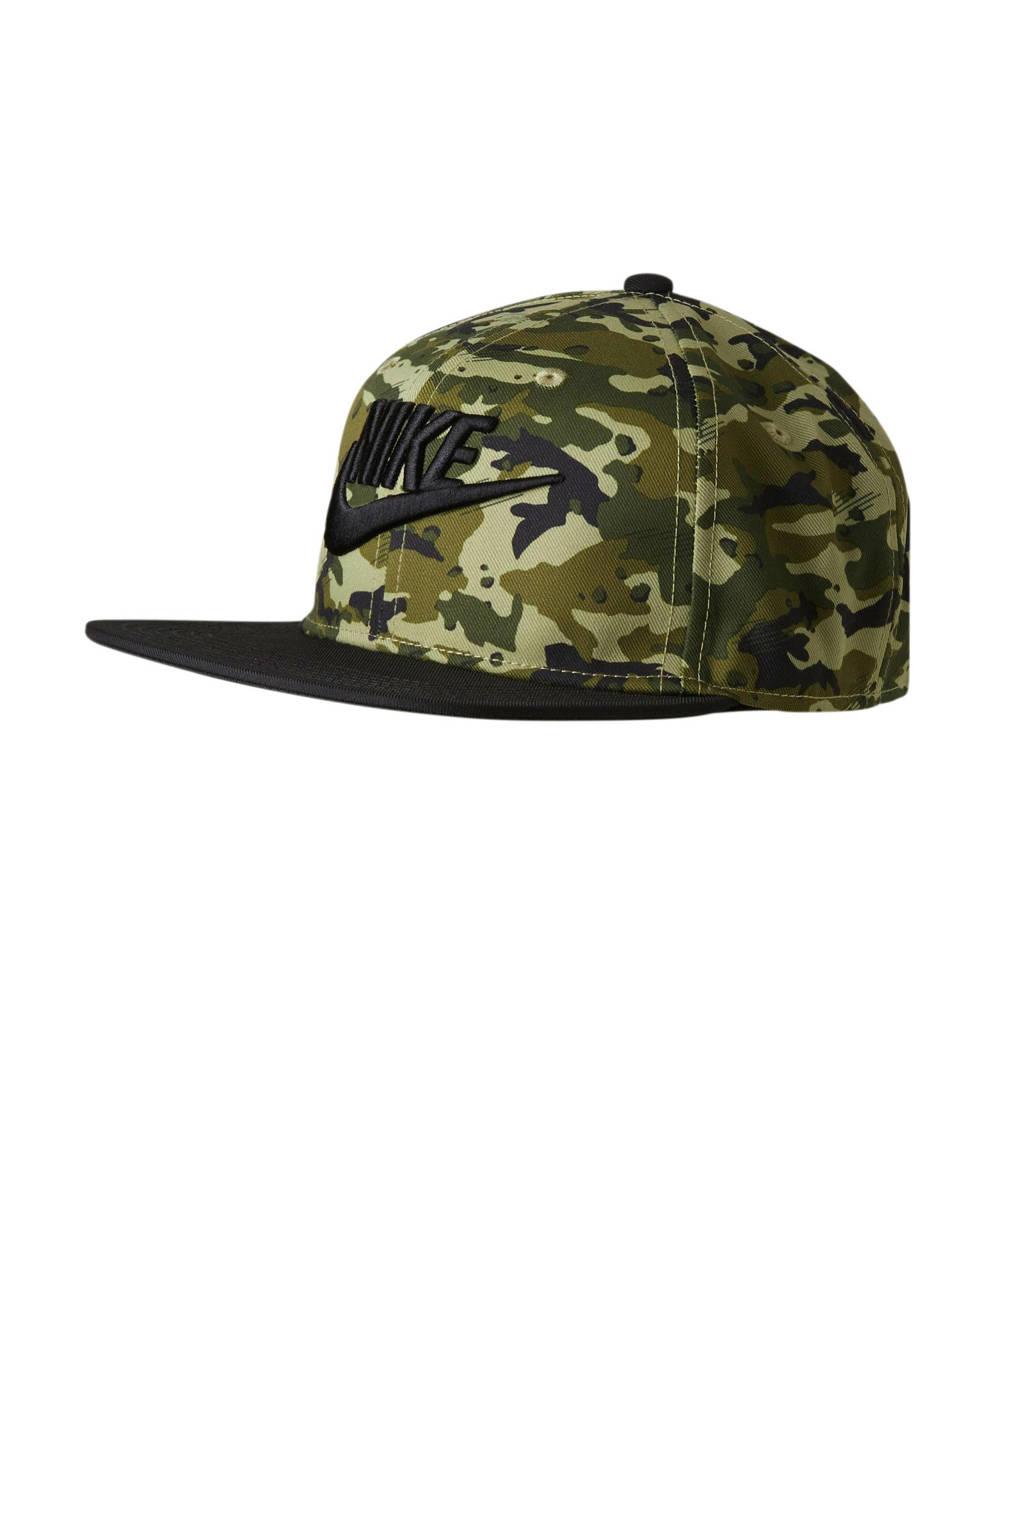 Nike pet met camouflageprint, Donkergroen